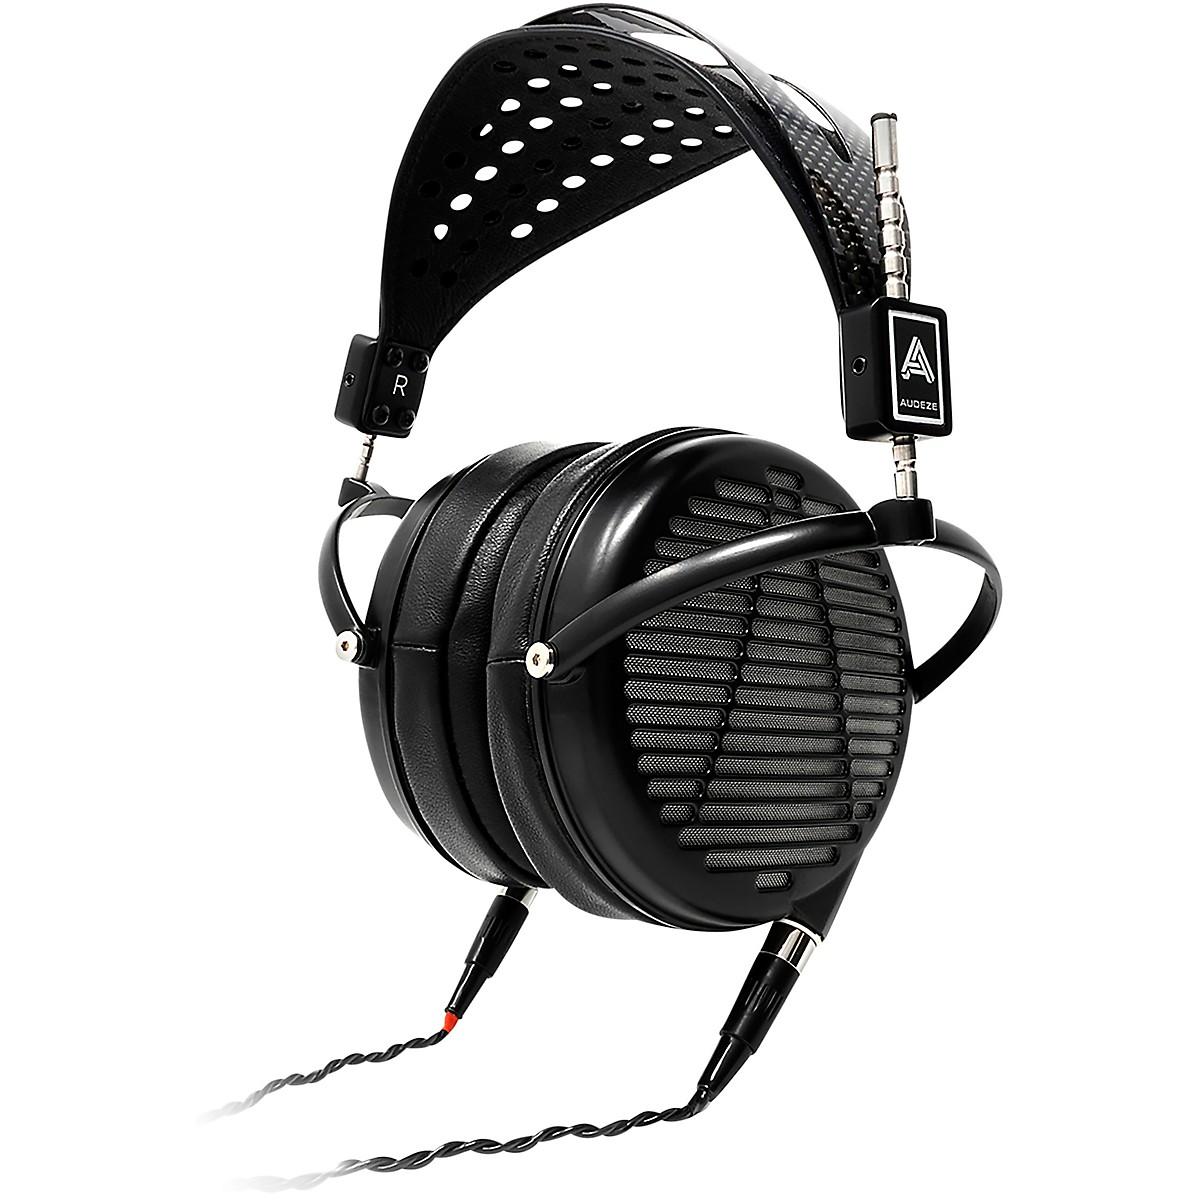 Audeze LCD-MX4 Planar Magnetic Headphones